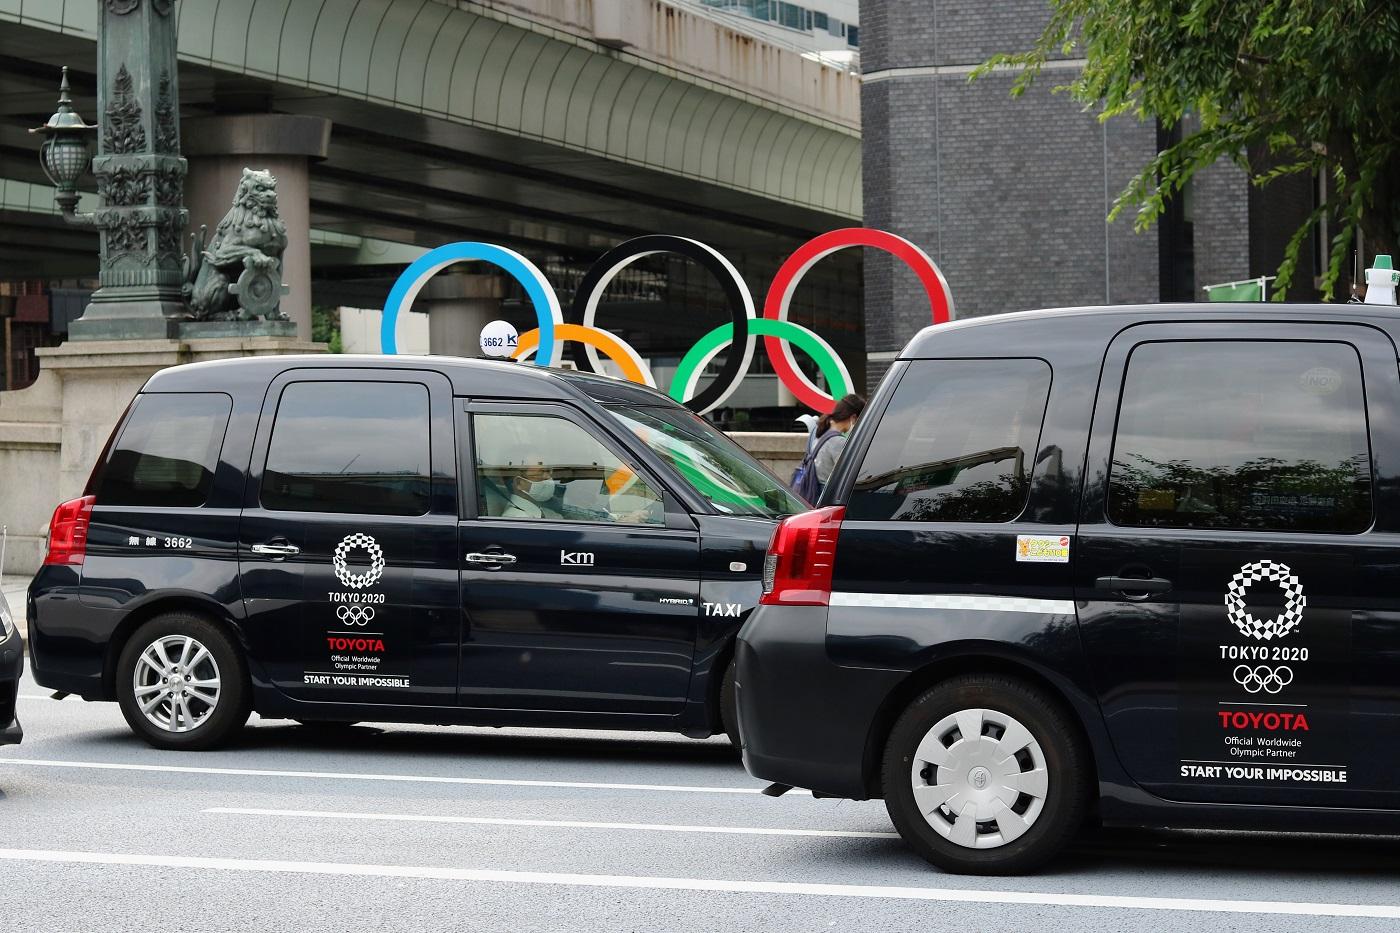 shutterstock_toyota taxi olympic โอลิมปิก